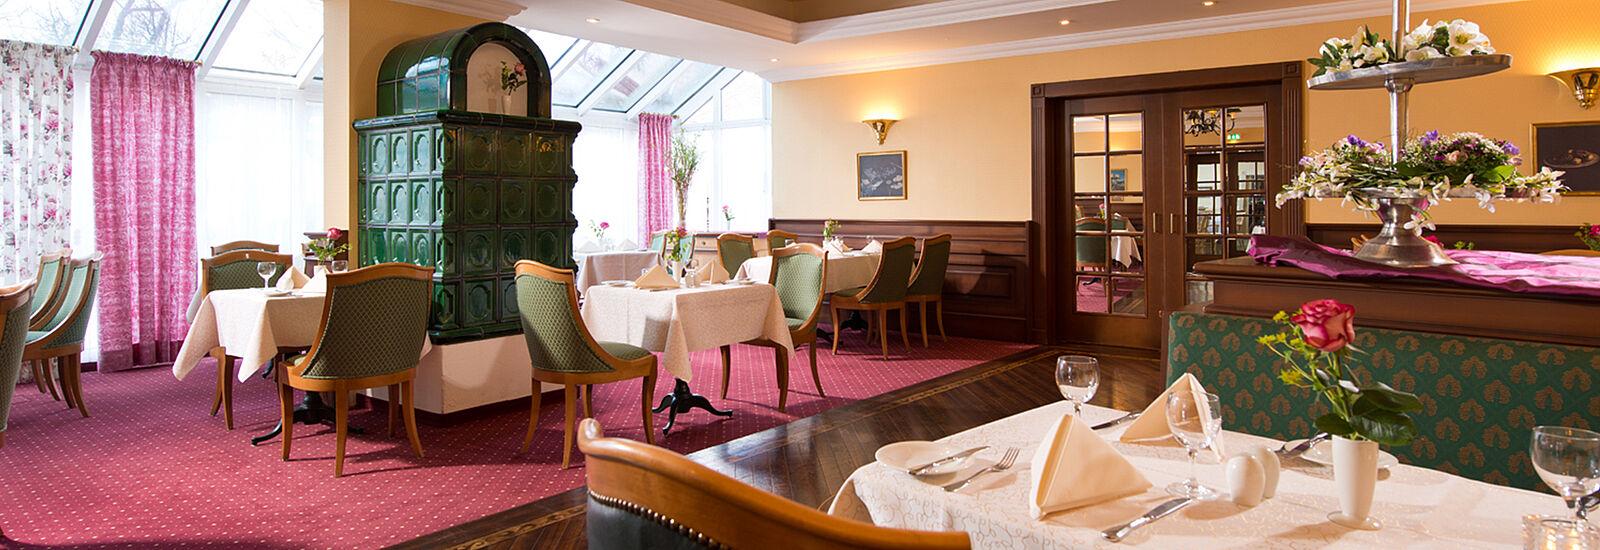 Cranach Stube_Hotel am Schlosspark